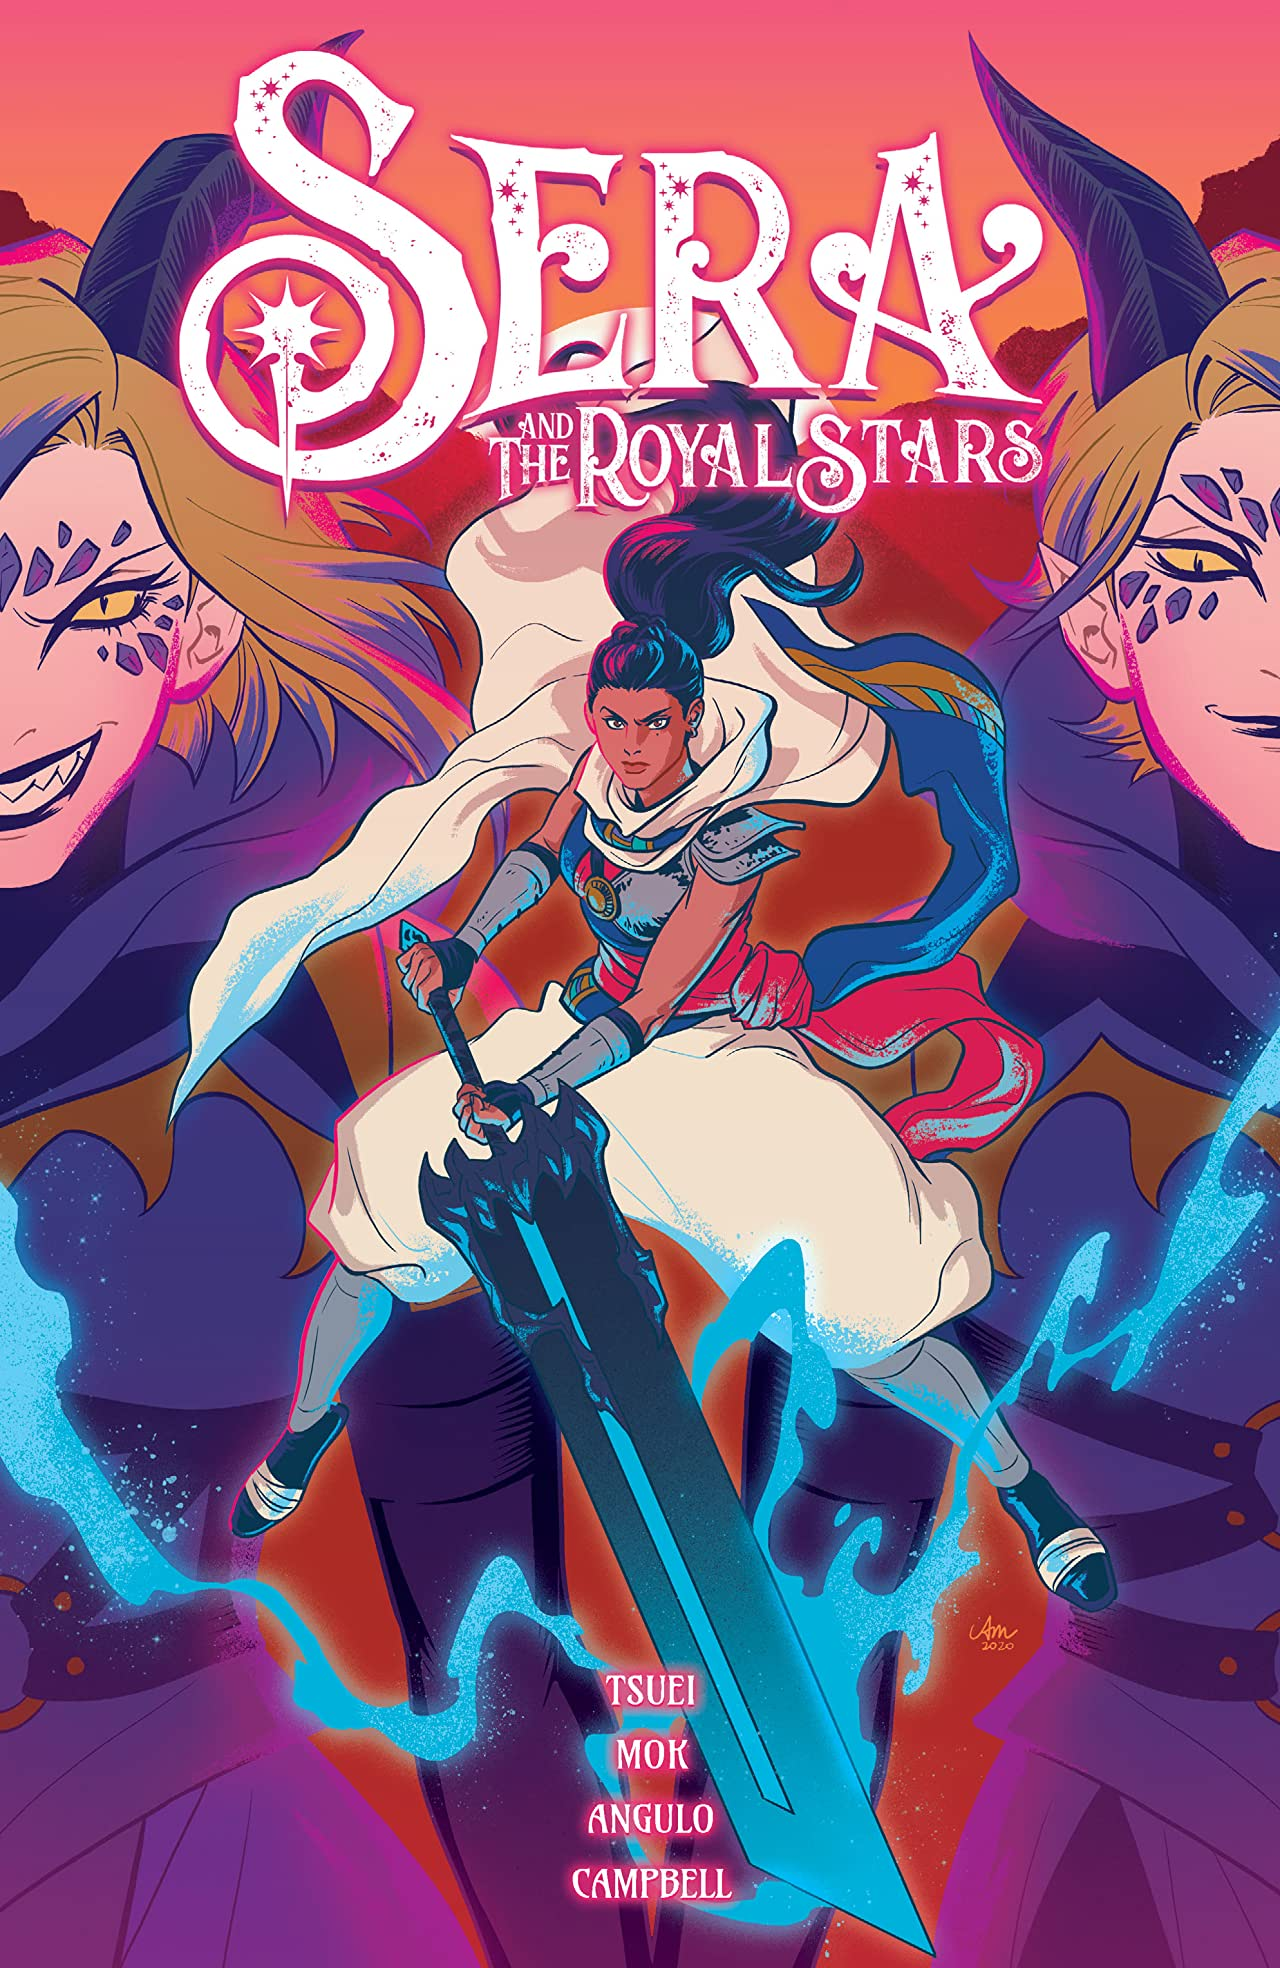 Sera & the Royal Stars Vol. 2